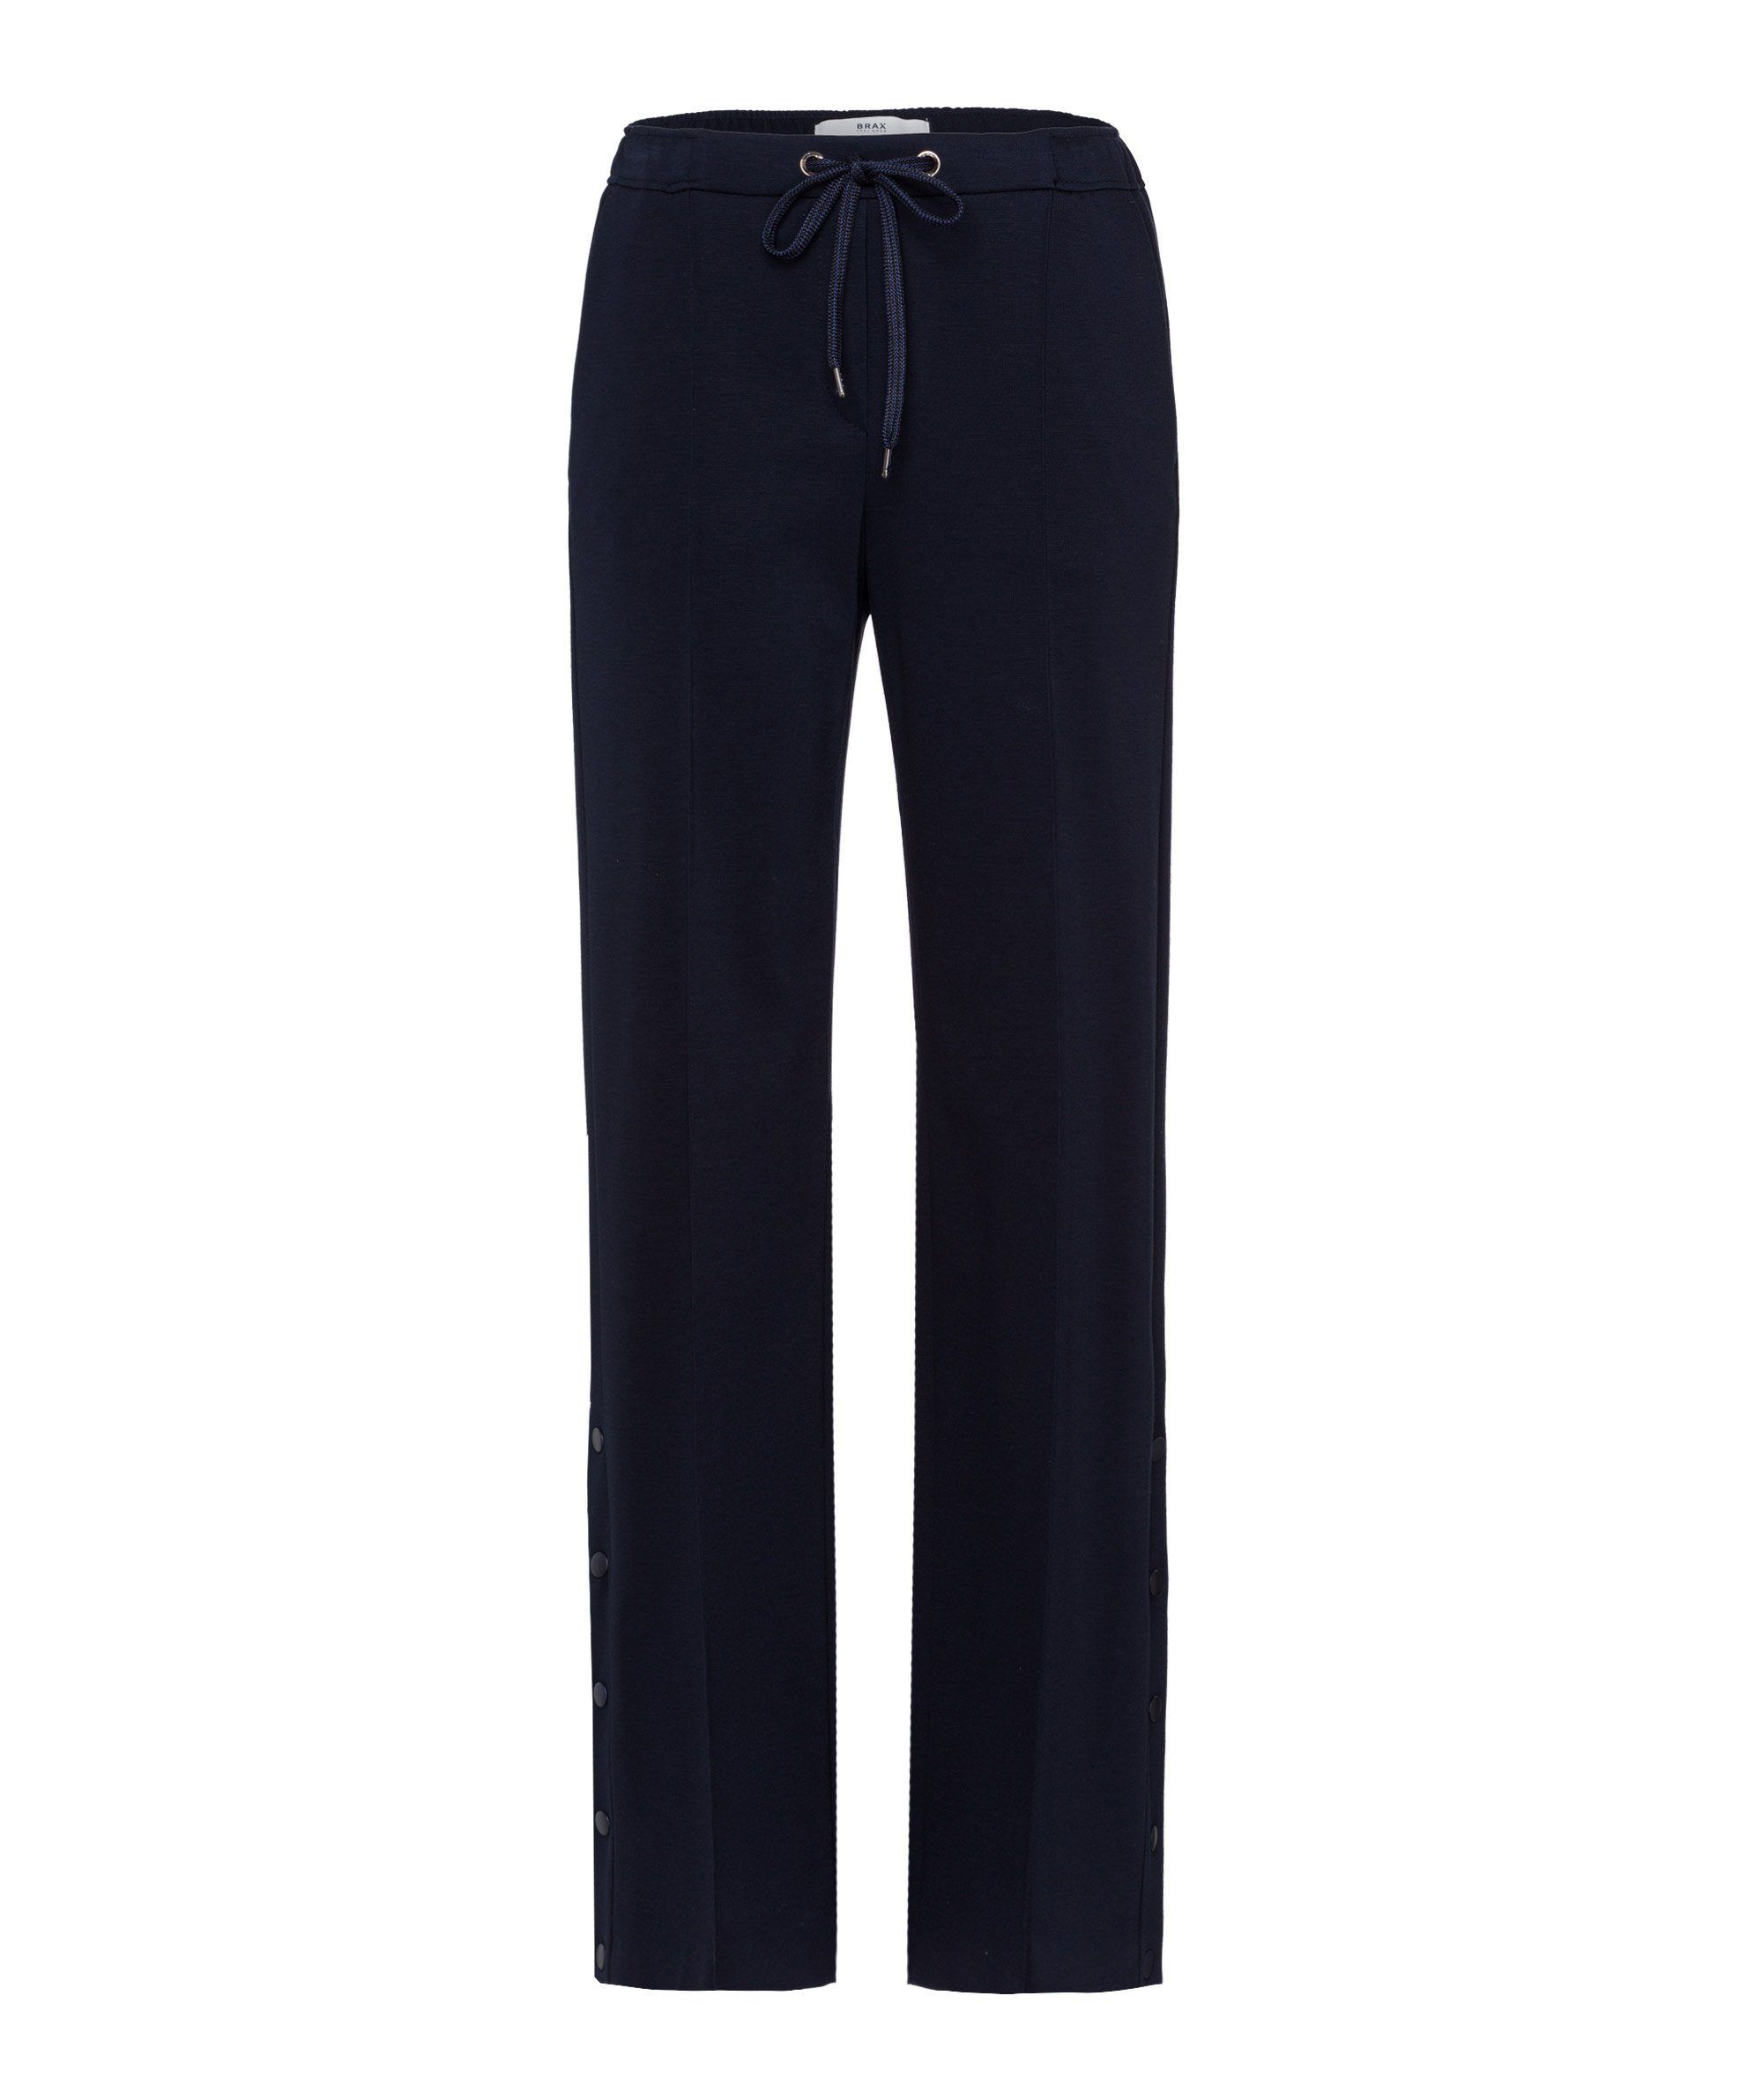 Maine« Pocket KaufenOtto Hose 5 »style Brax Online 29WHDIE